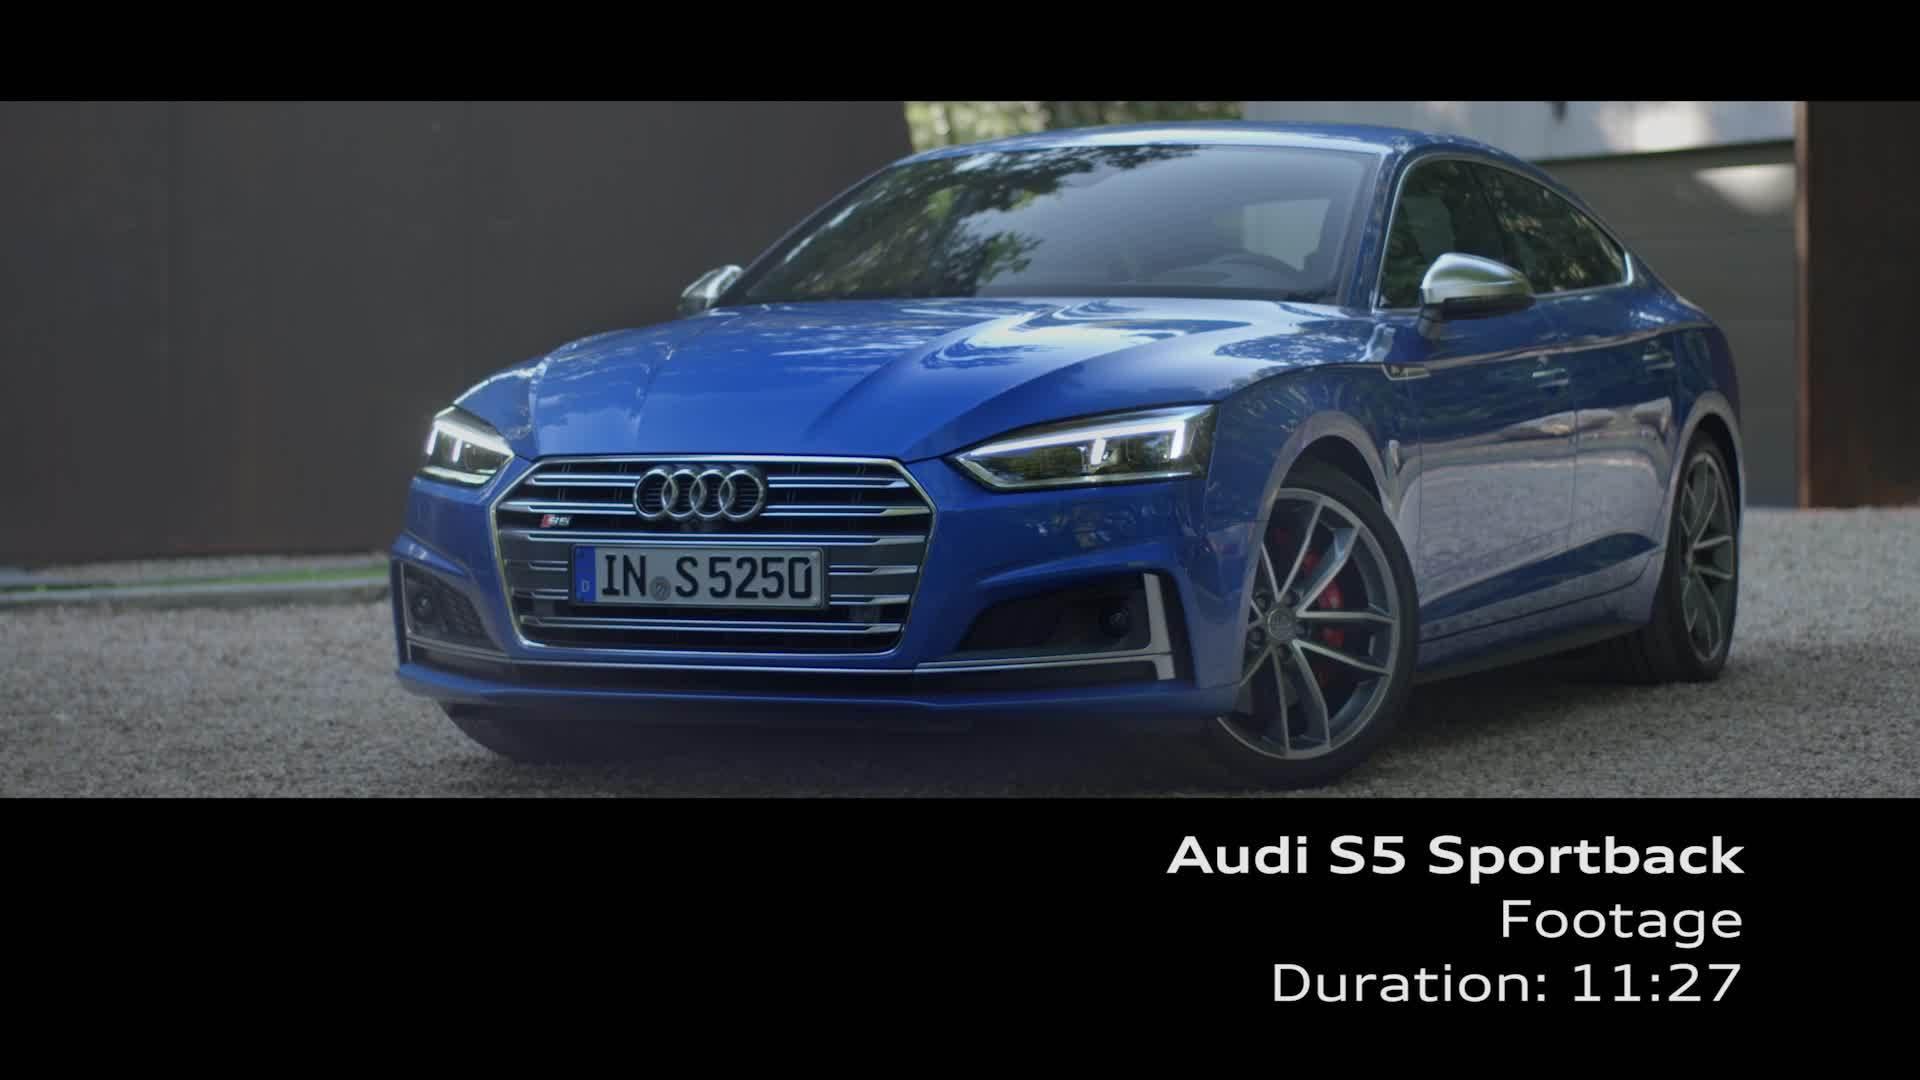 Audi S5 Sportback Footage